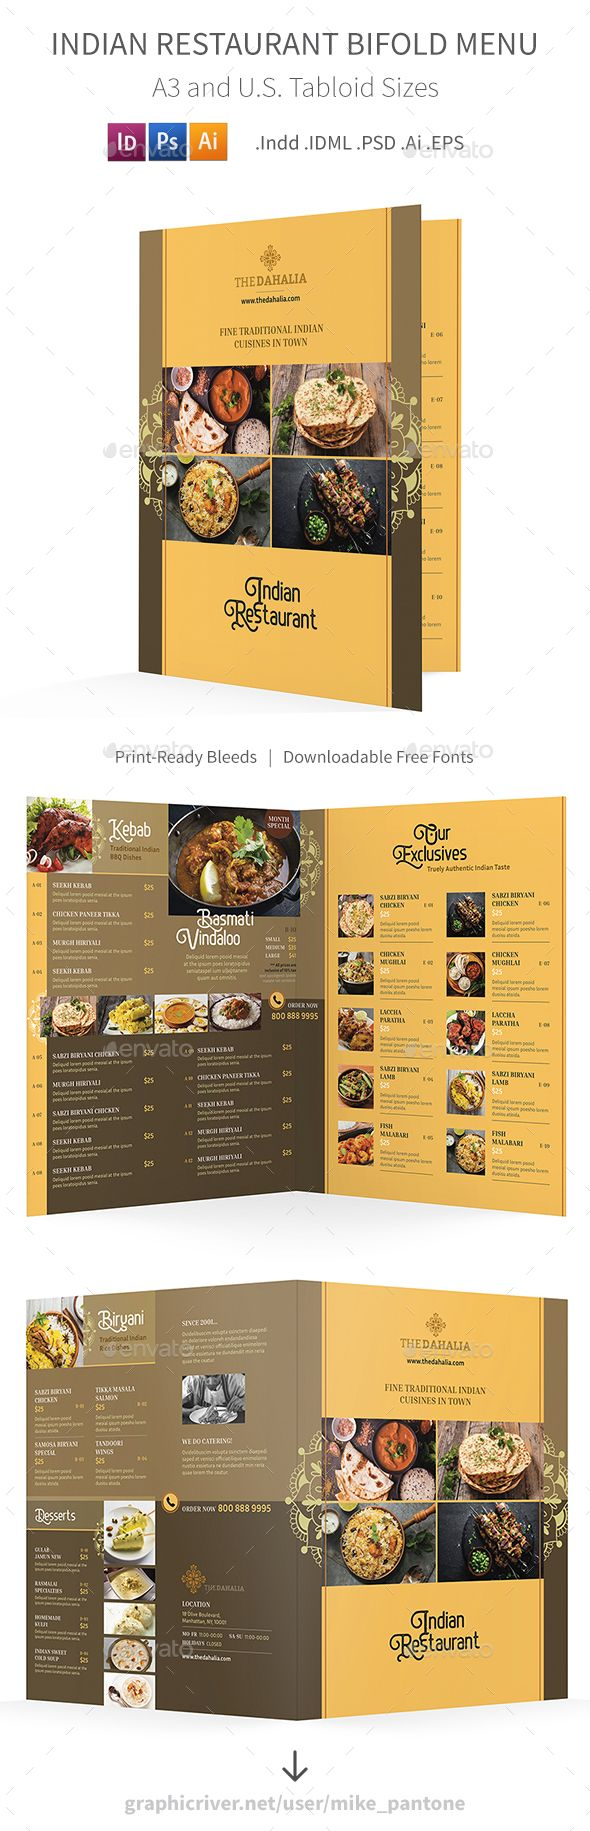 Indian Restaurant Bifold / Halffold Menu 2 | Menu templates, Food ...